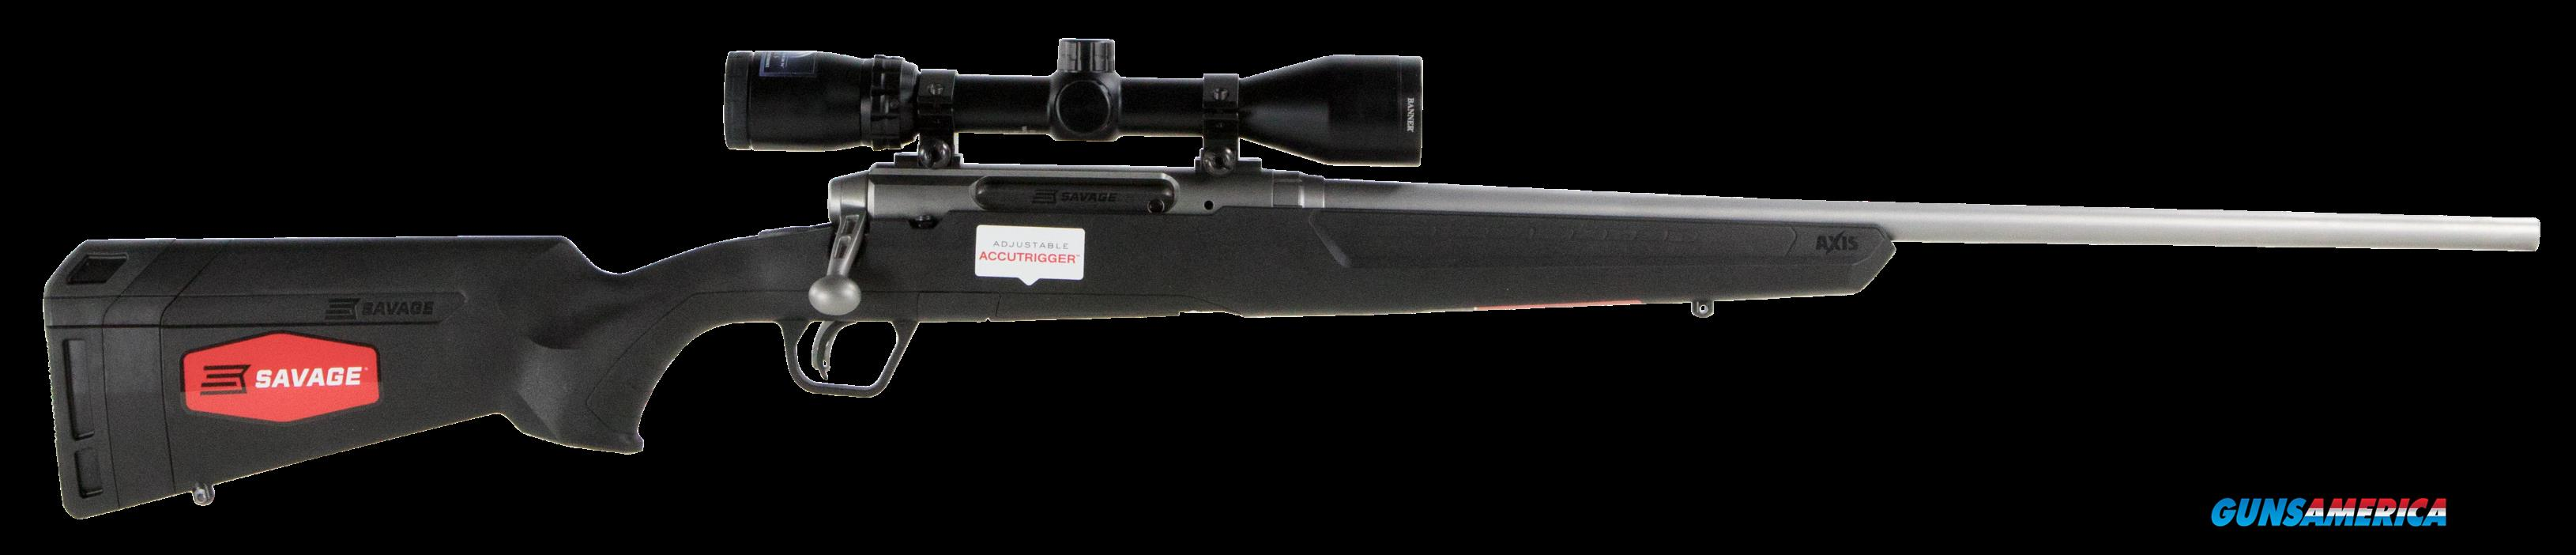 Savage Axis Ii, Sav 57101 Axis Ii Xp Ss  223 Rem          Bushnell  Guns > Pistols > 1911 Pistol Copies (non-Colt)